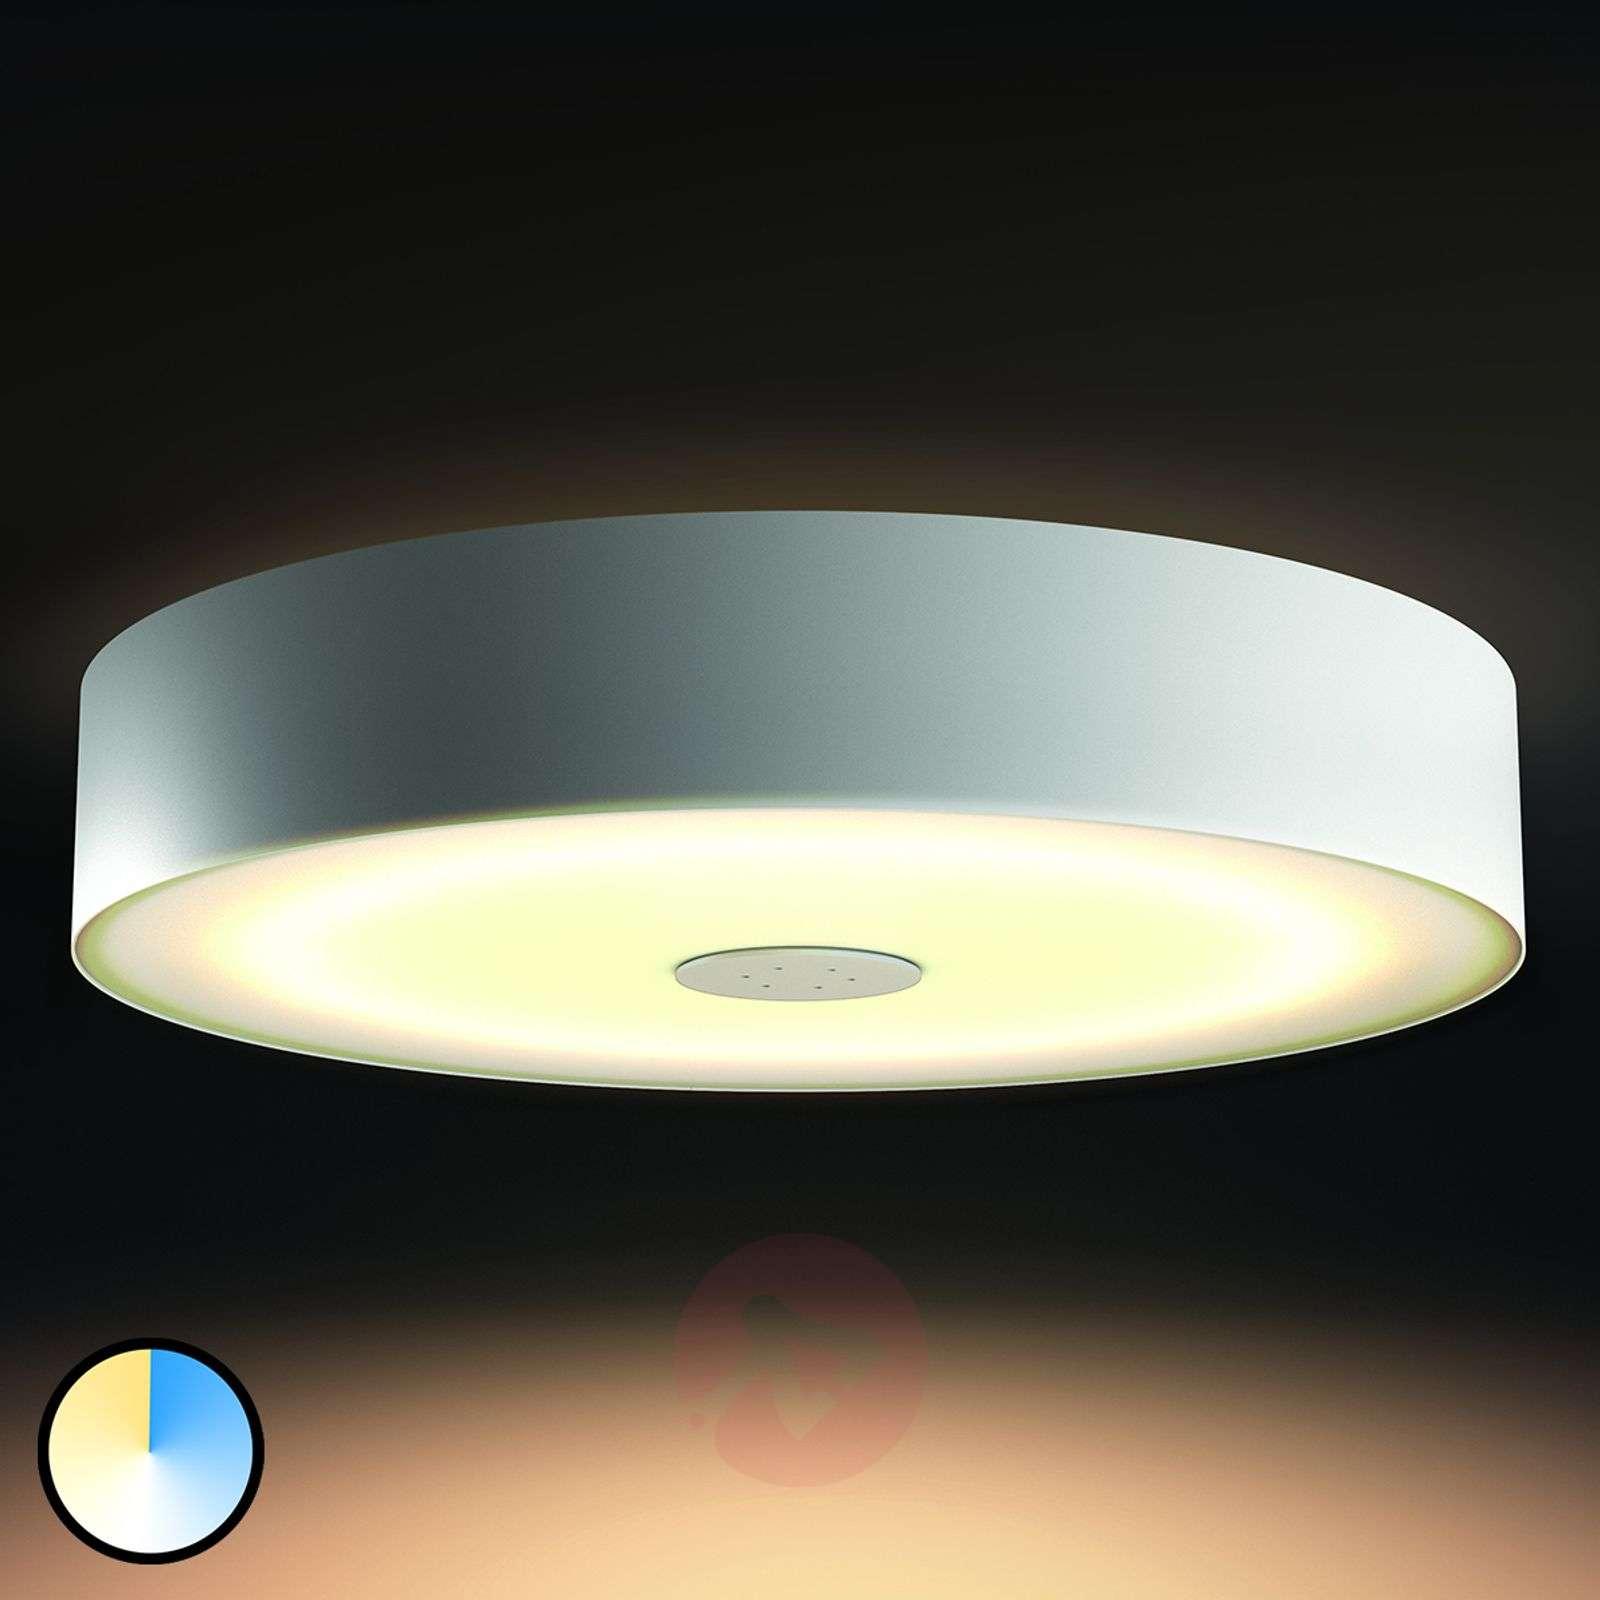 Functional Philips Hue LED Ceiling Lamp Fair 7531871 01 ...